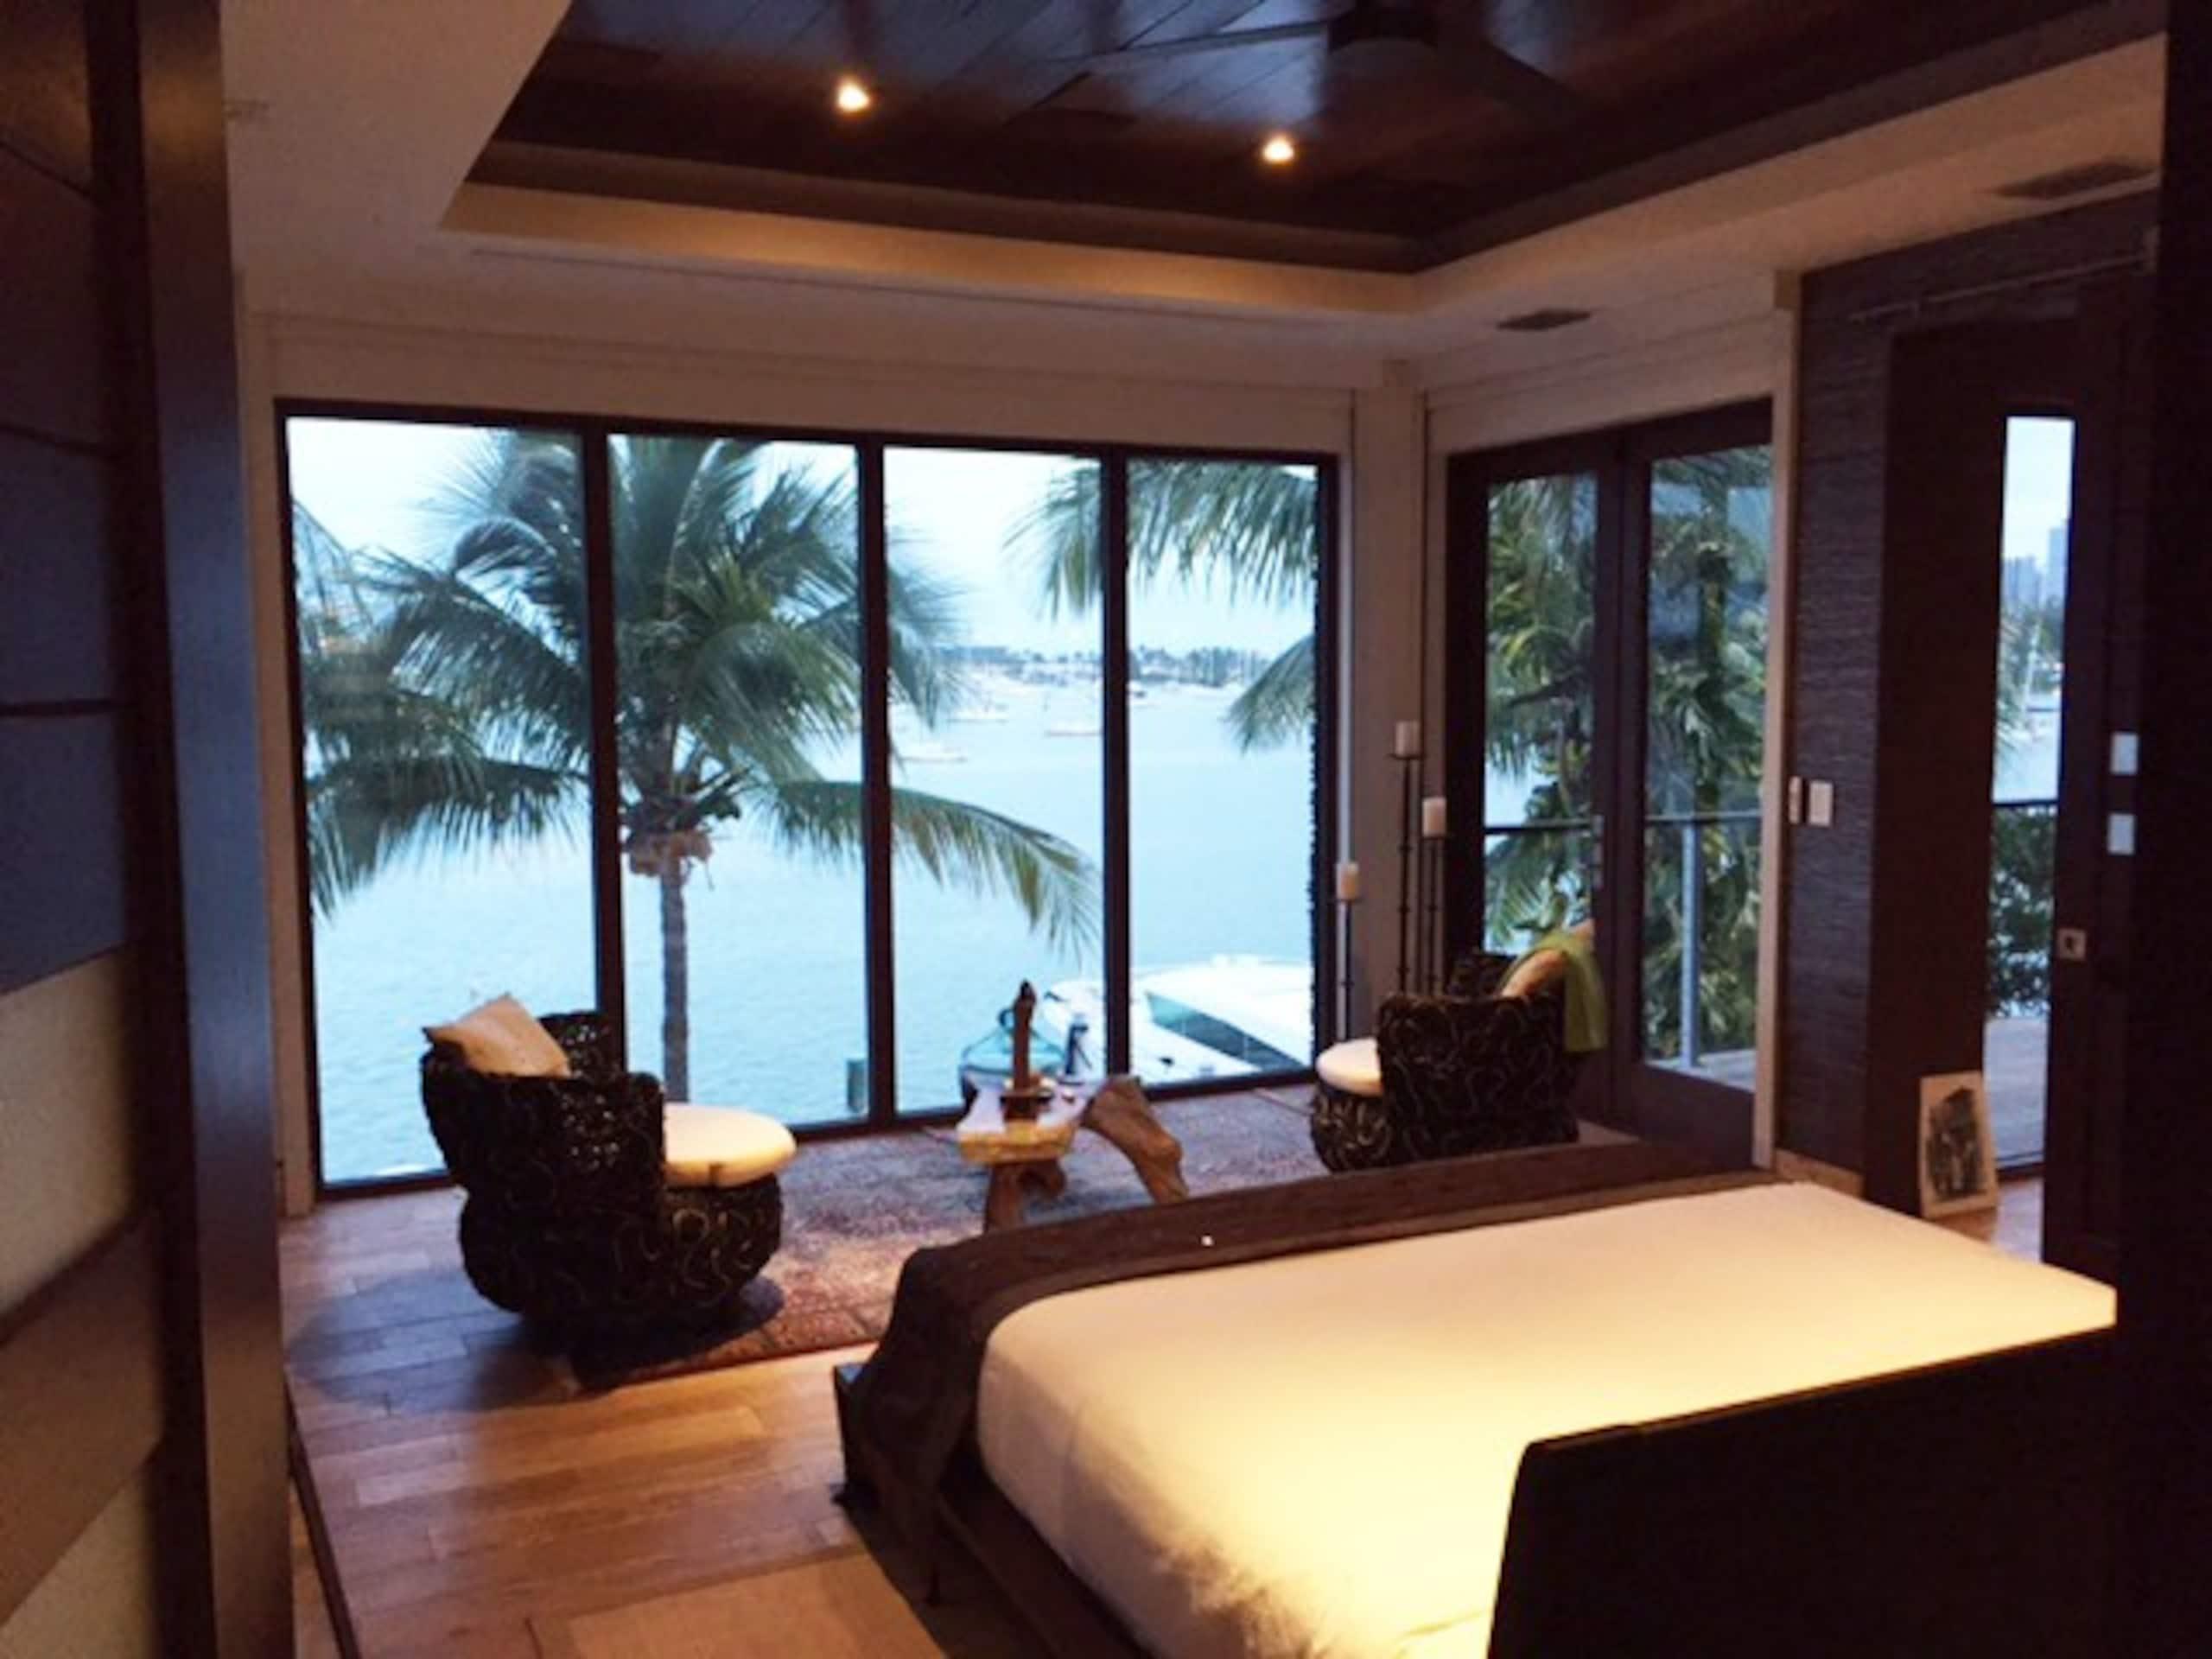 Apartment Villa Riza - Magnificent Balinese-style photo 20108730